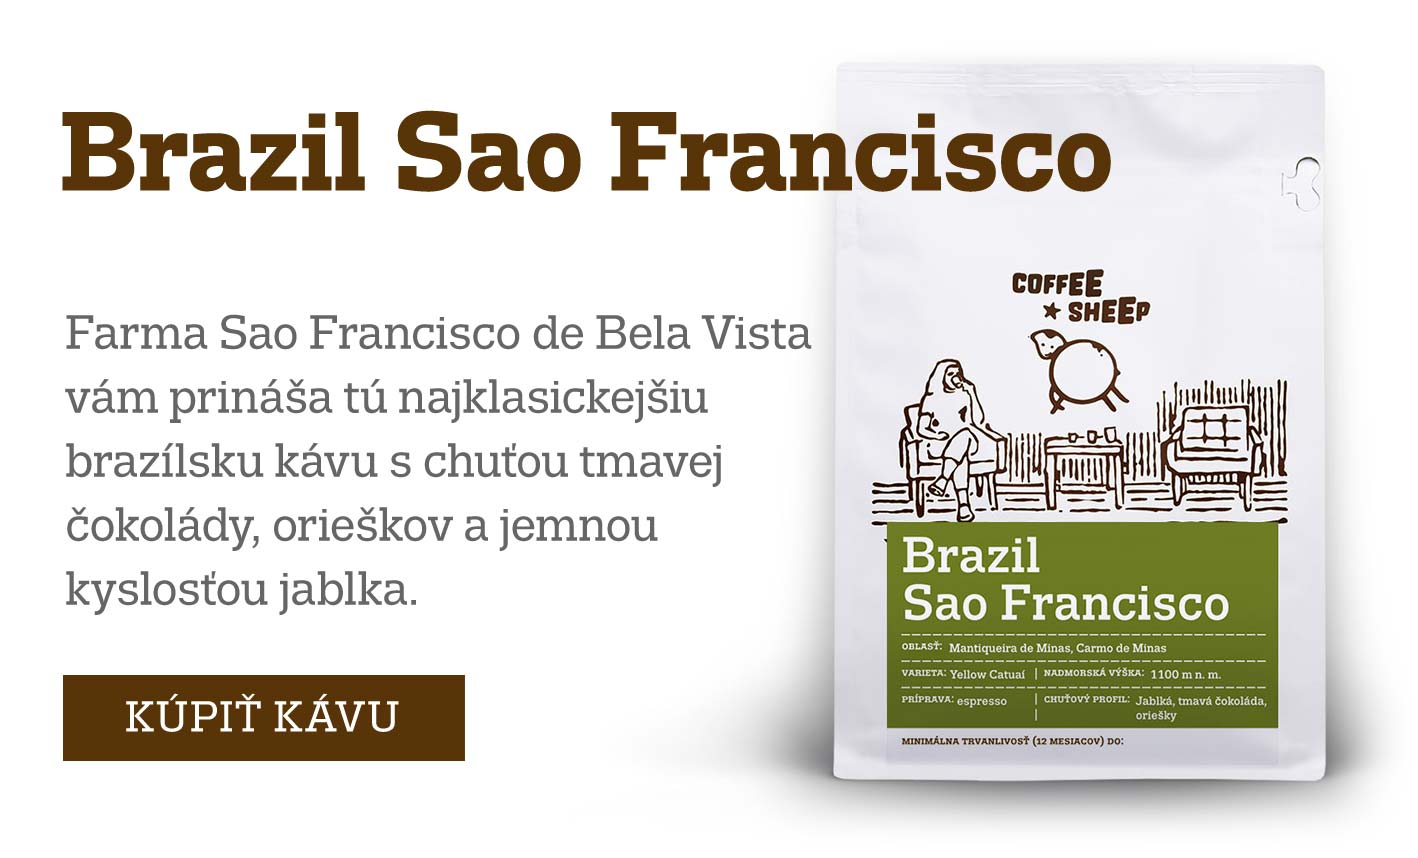 Brazil Sao Francisco